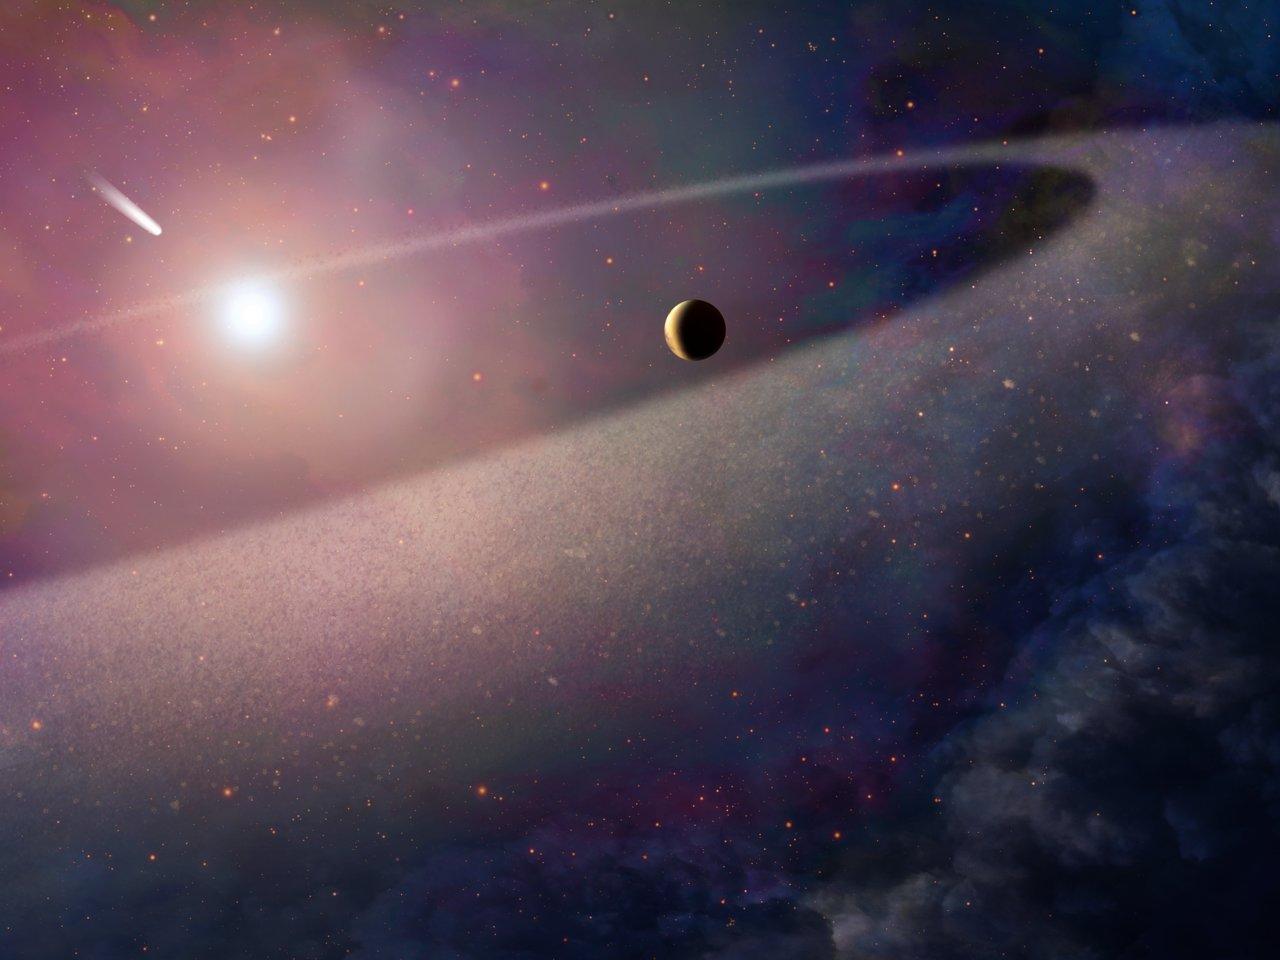 Comet_falling_into_white_dwarf_(artist's_impression).jpg